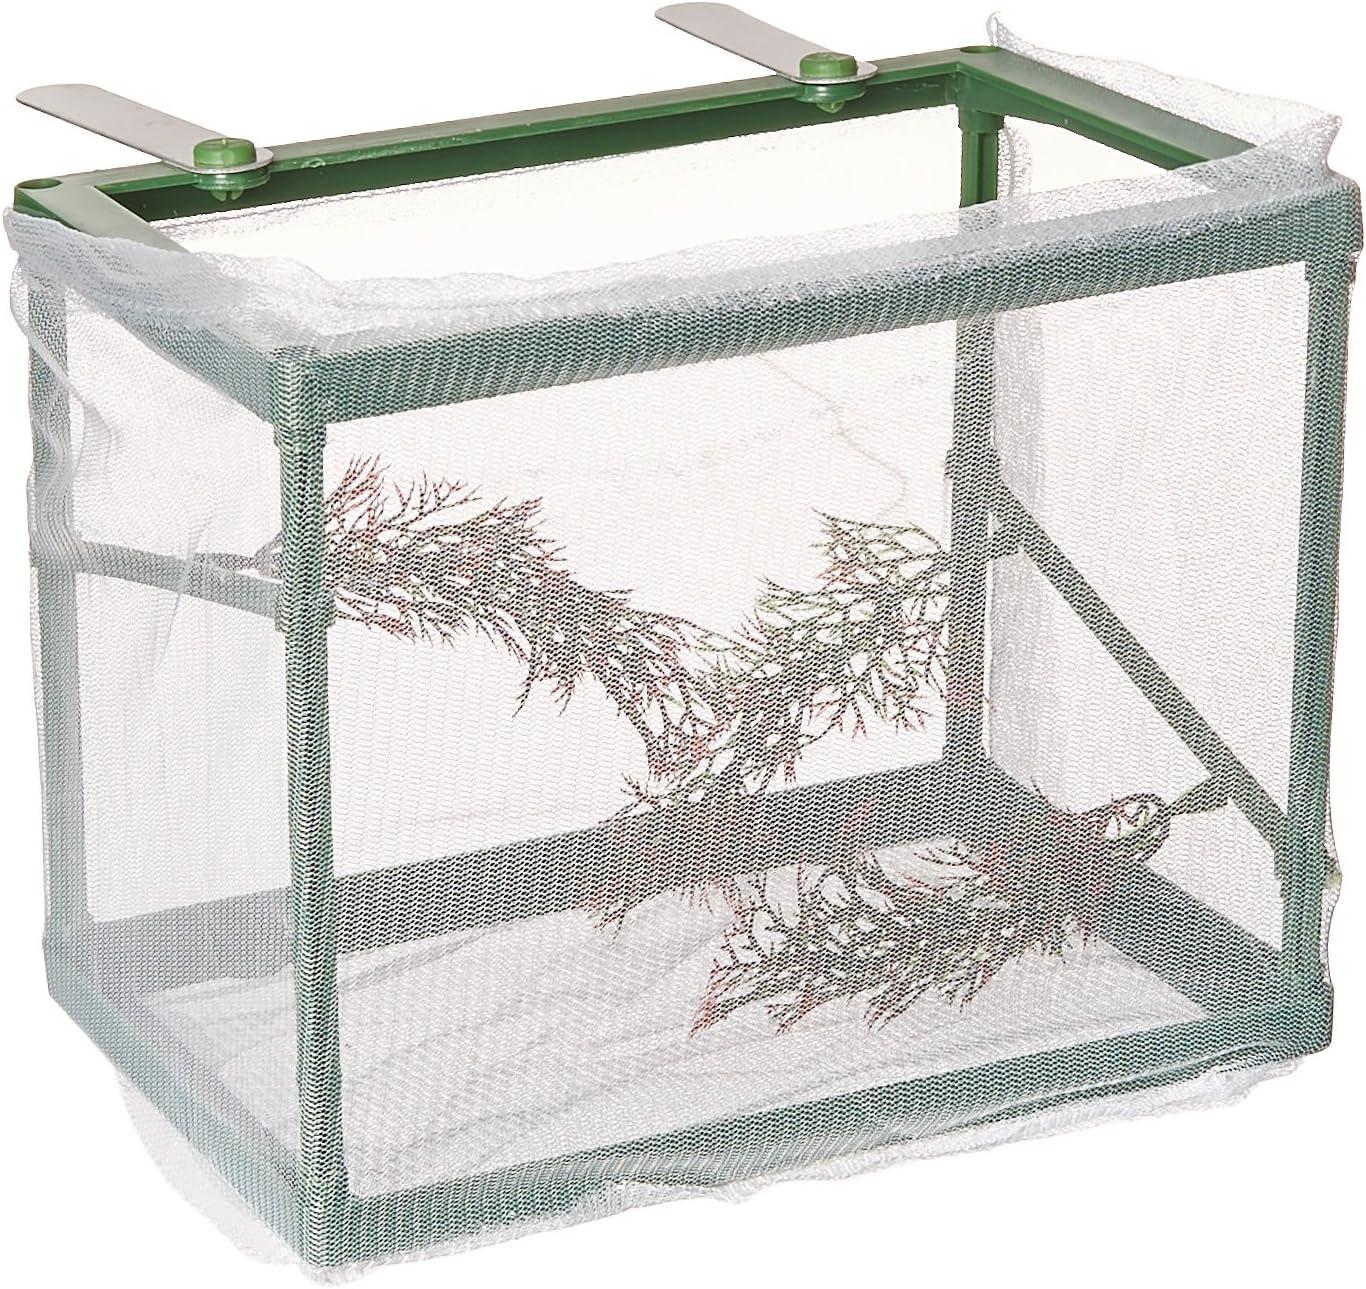 Penn Plax Net Breeder for Aquarium